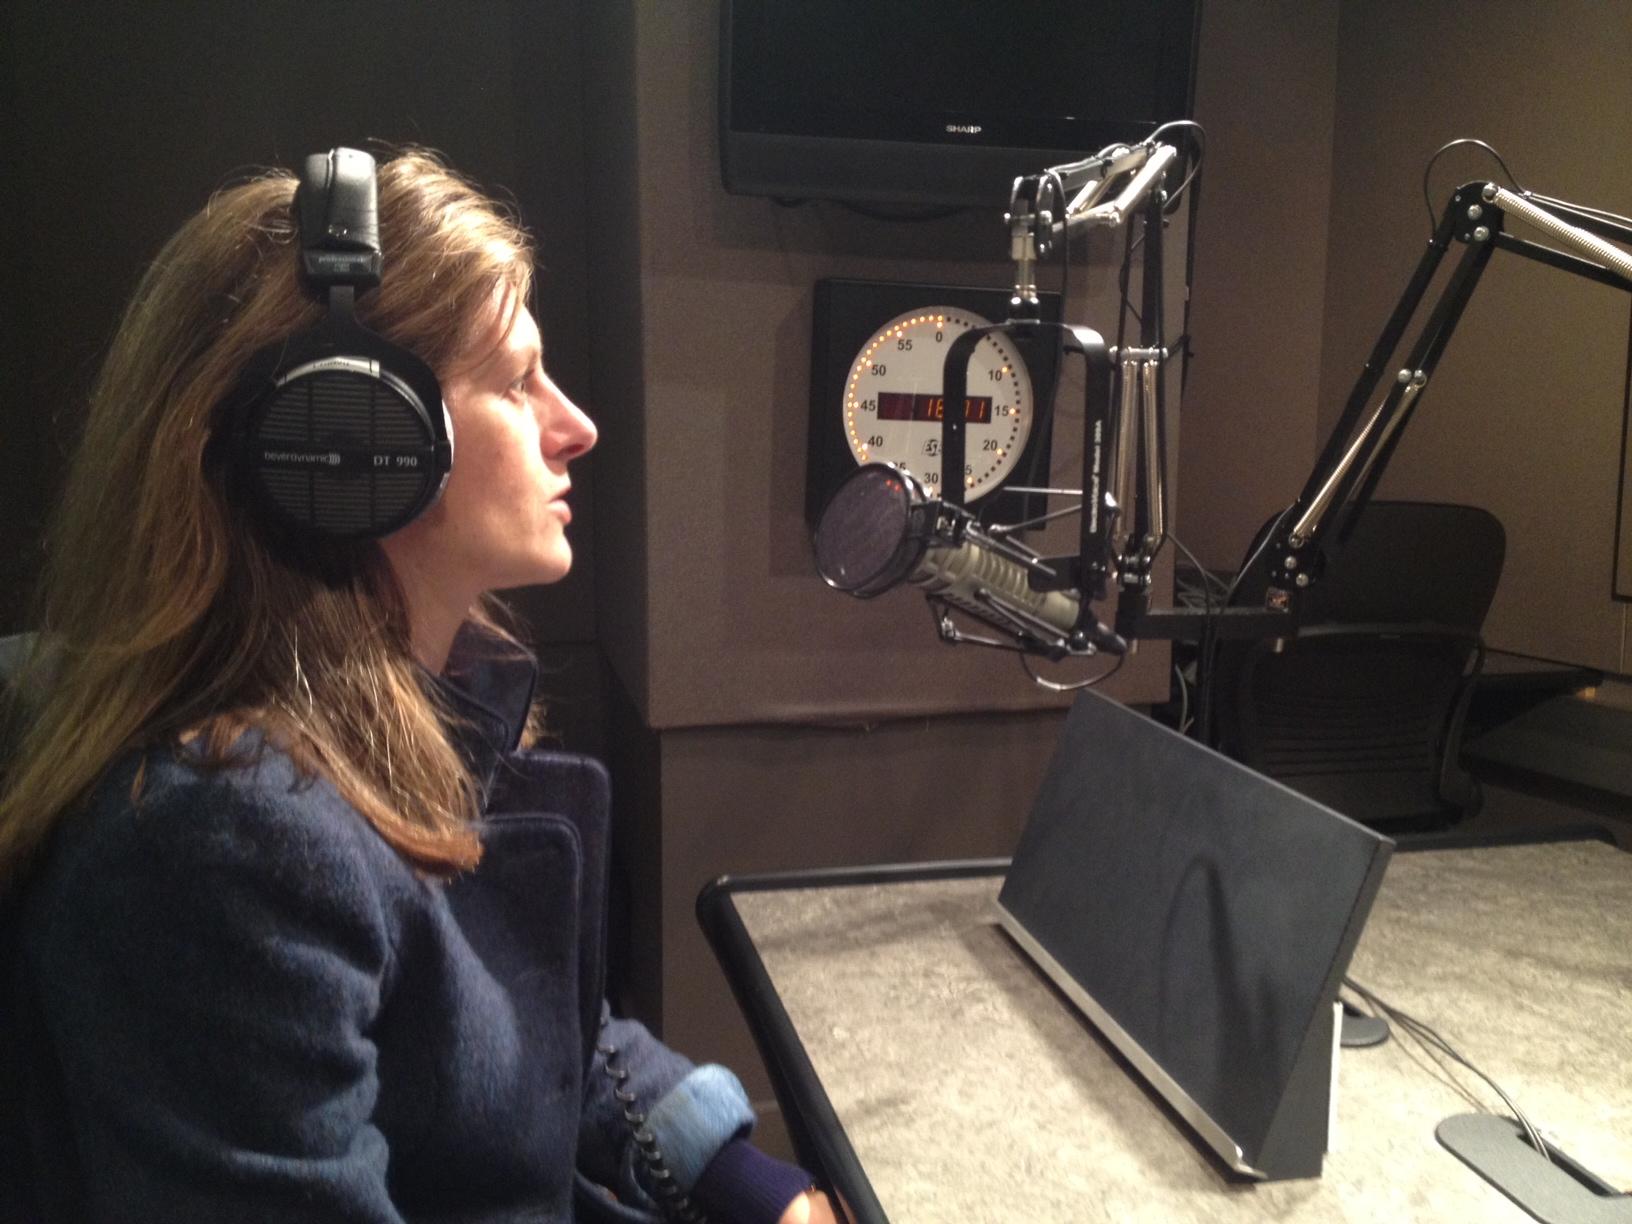 Ashley Milne-Tyte recording in a studio.